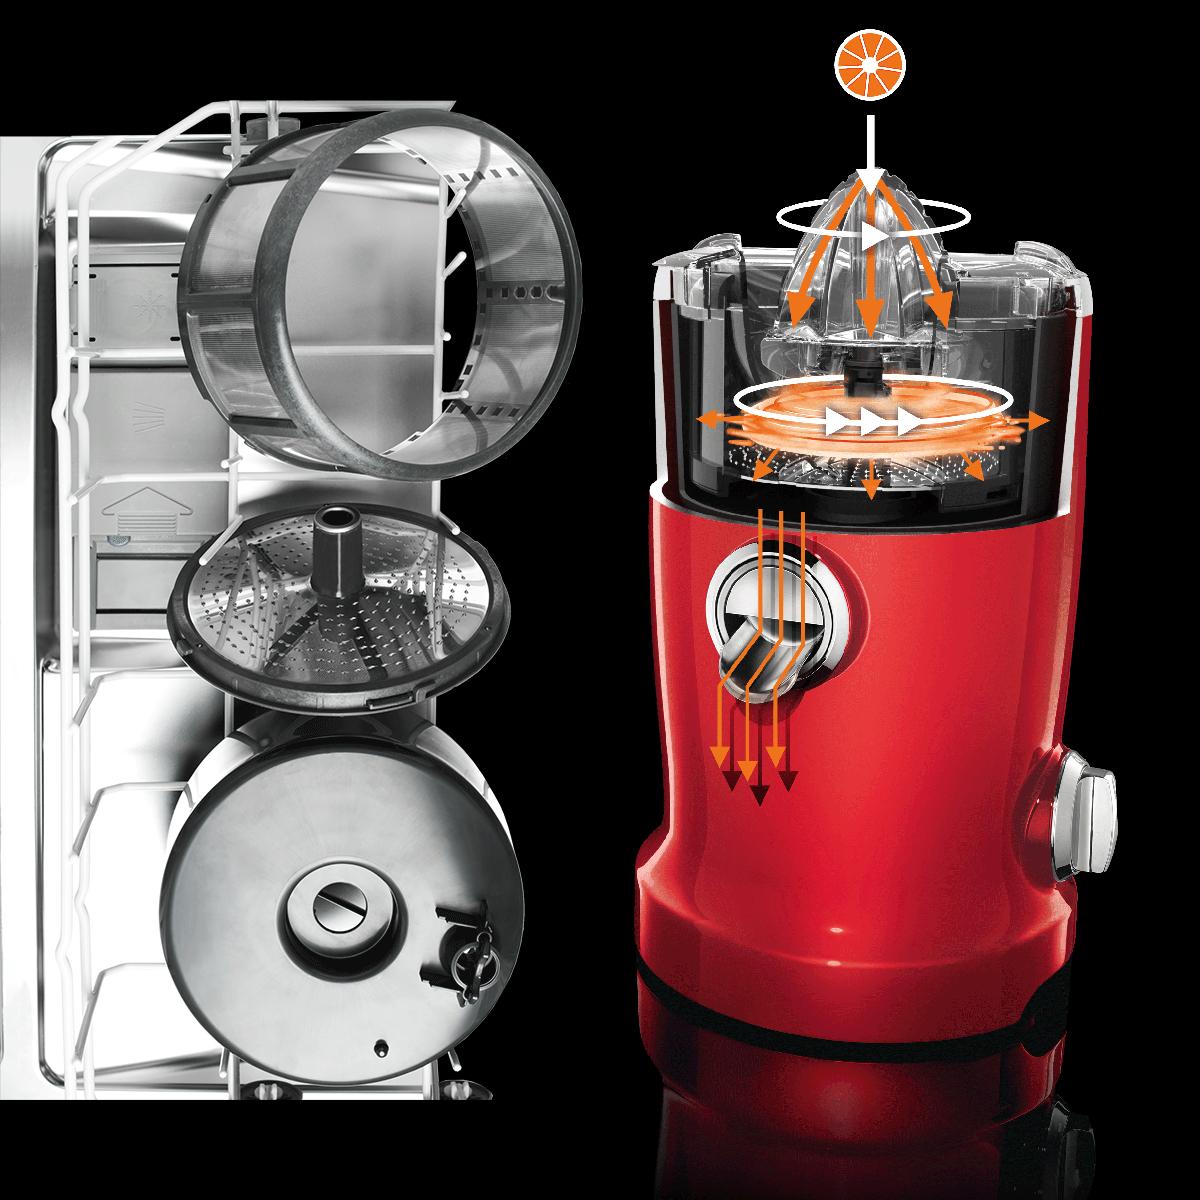 Novis Vita Juicer Orange 4-in-1 Multi-Function Electric Juicer